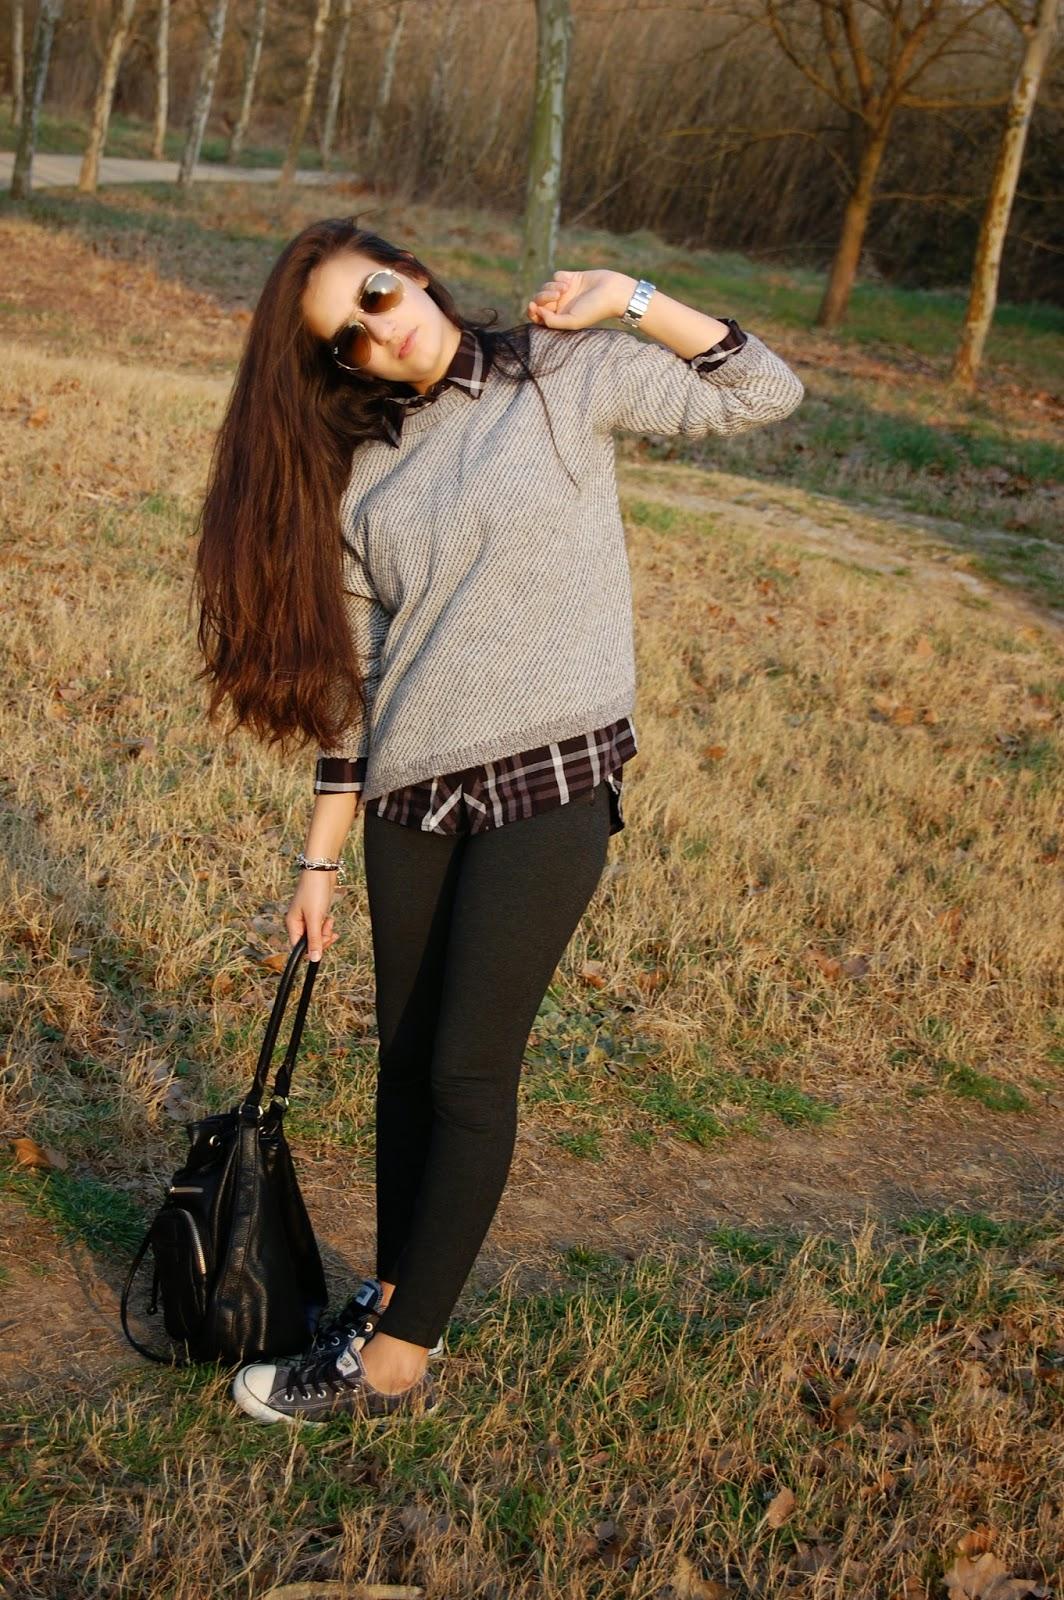 jersey mango gris, camisa cuadros negra, leggings gris zara, converse grises, bolso negro zara, ray-ban aviator